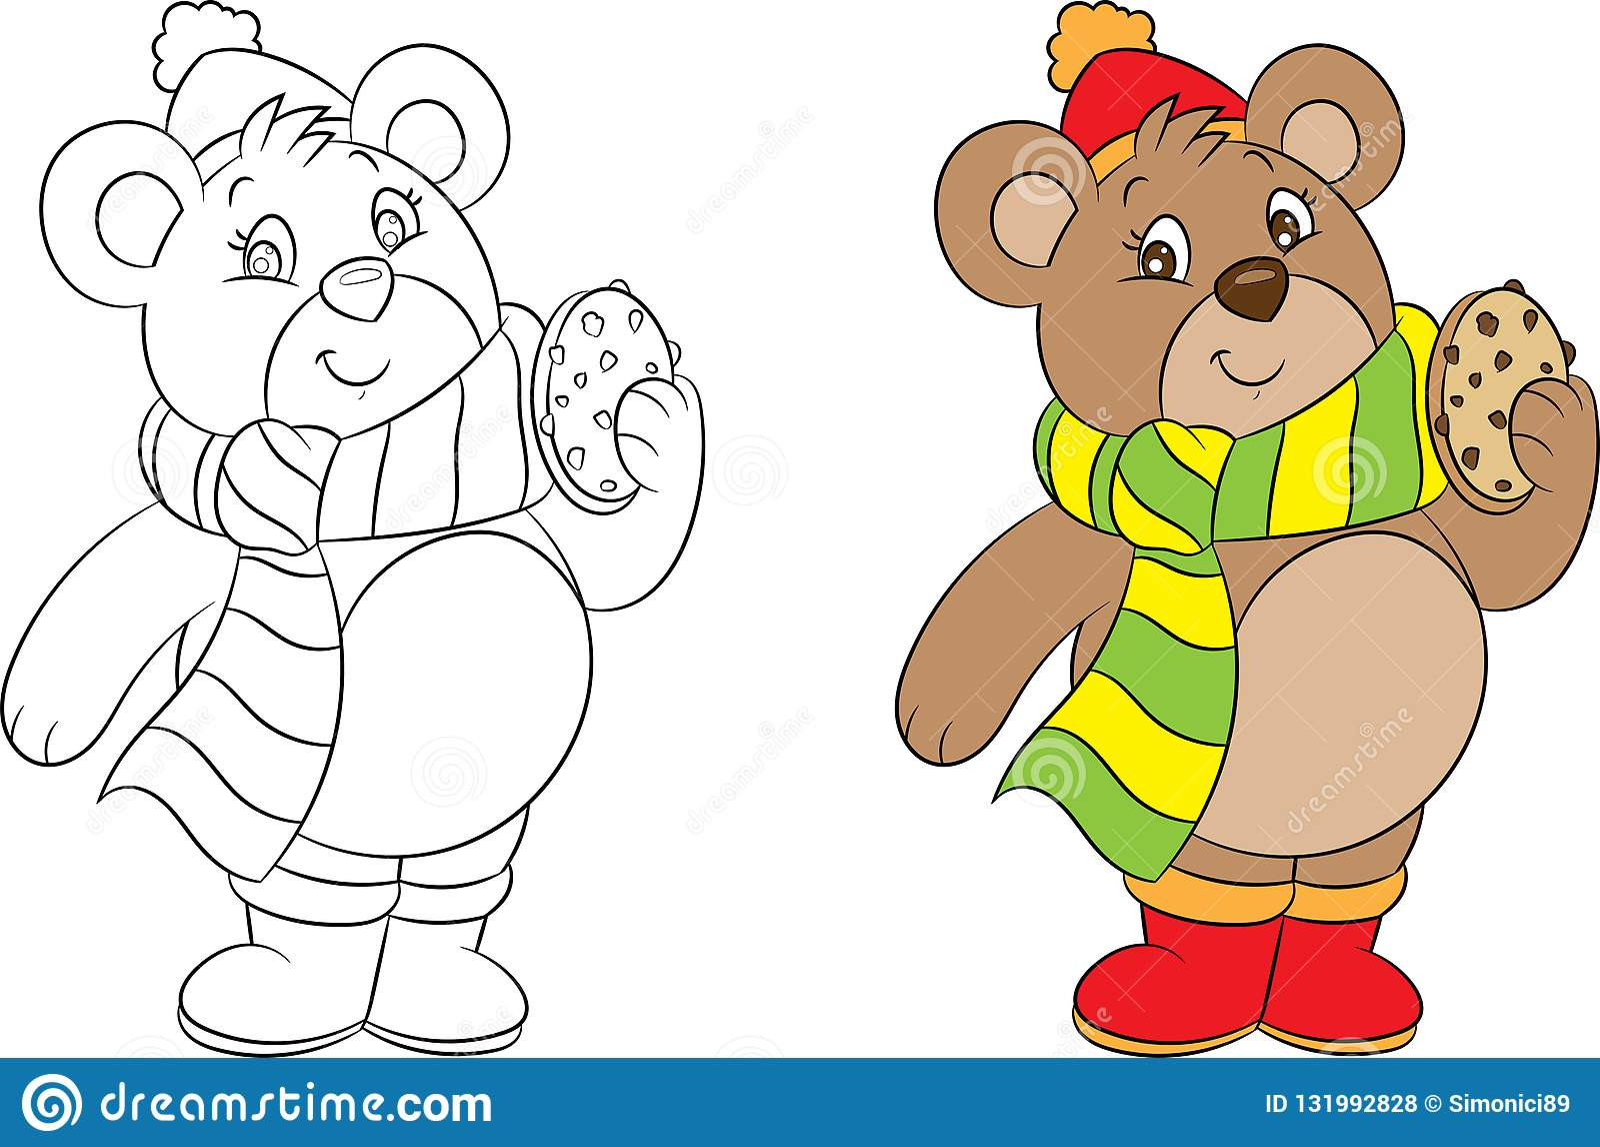 Bear Coloring Book Stock Illustrations 2 722 Bear Coloring Book Stock Illustrations Vectors Clipart Dreamstime